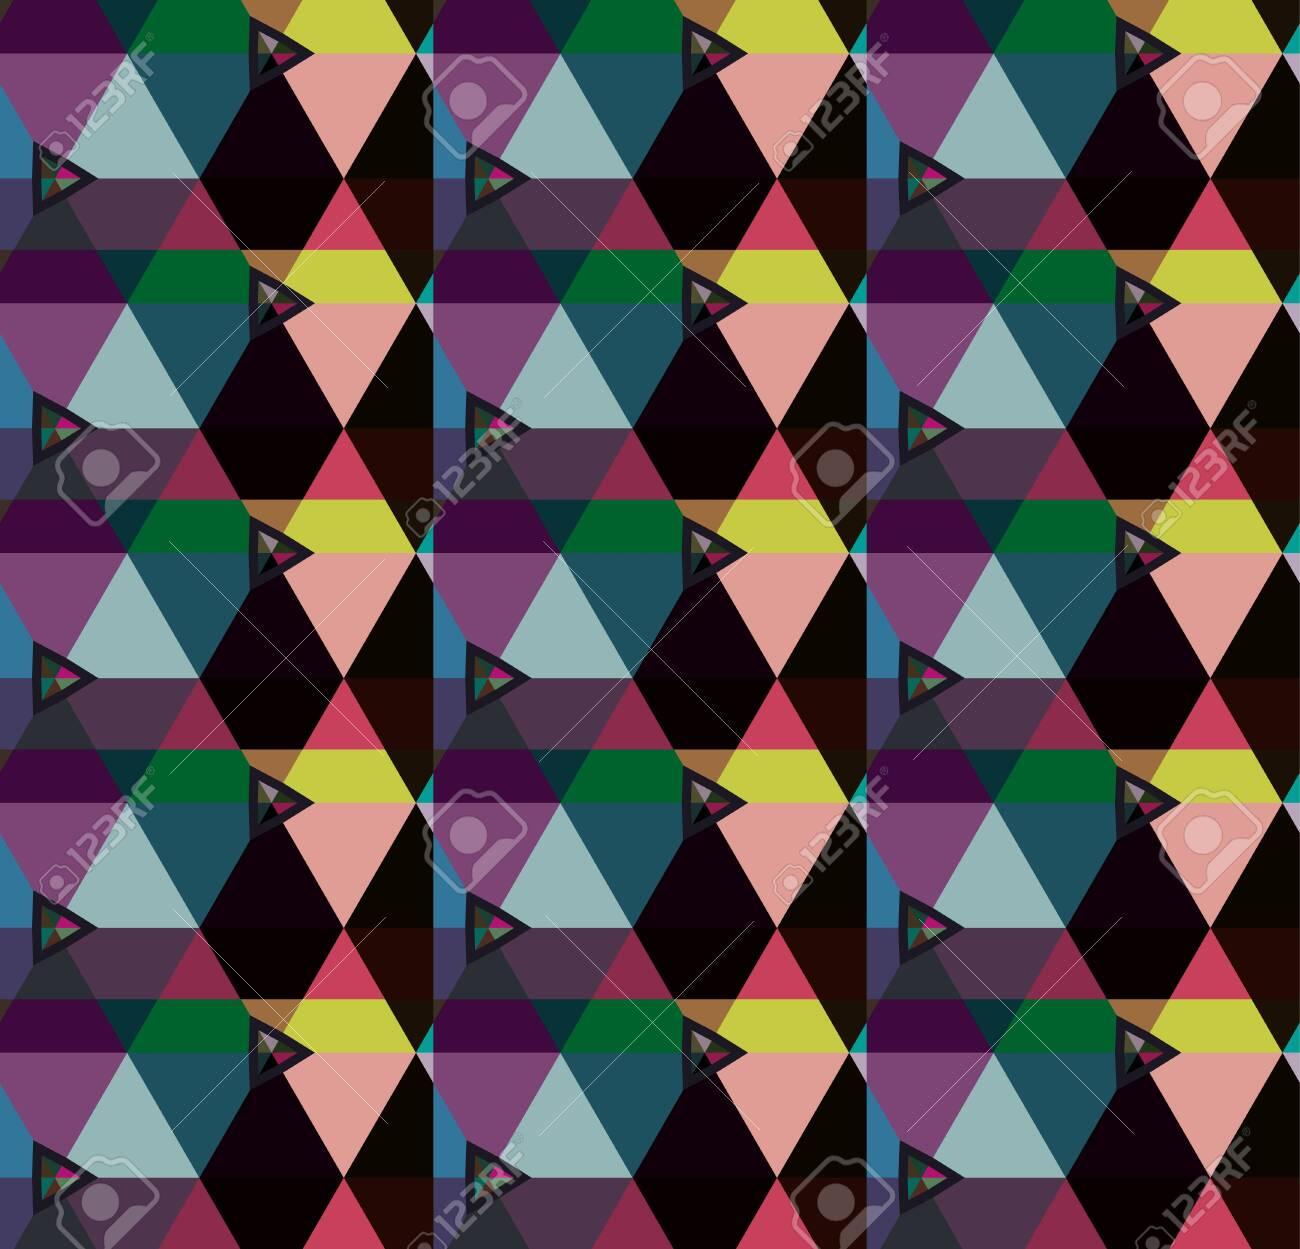 Seamless vector pattern in geometric ornamental style - 133456072